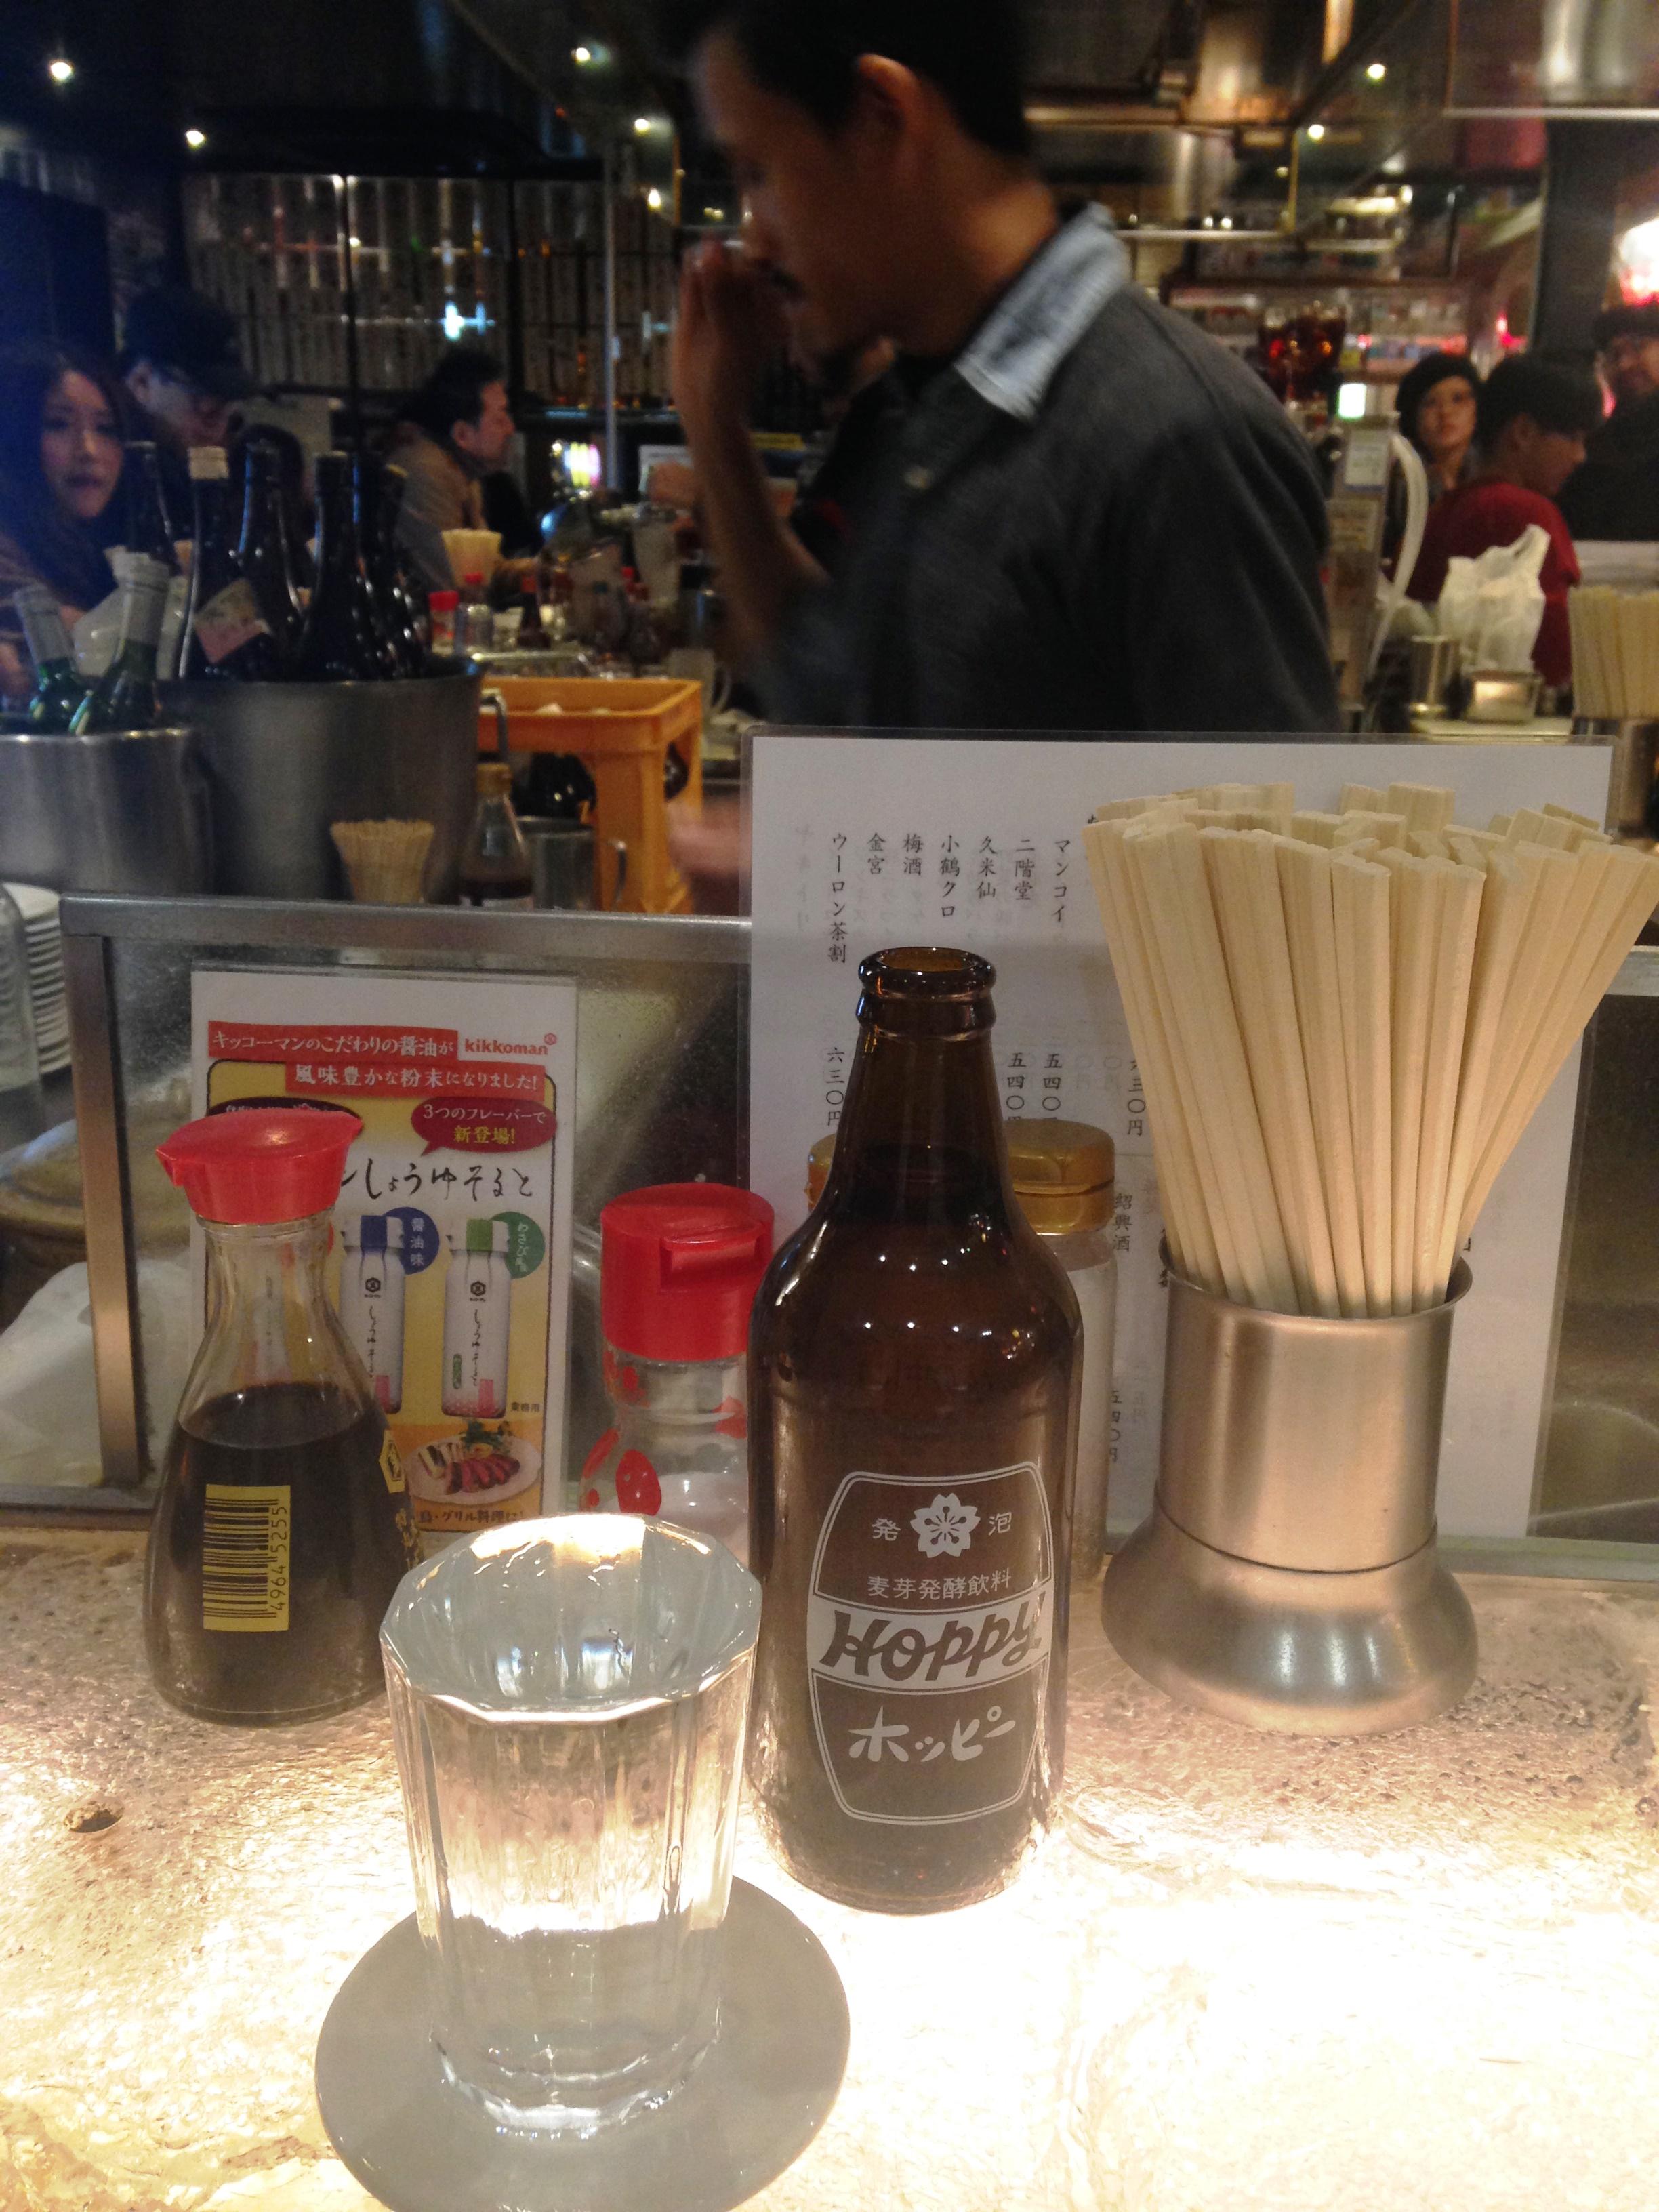 IMG: A bar.